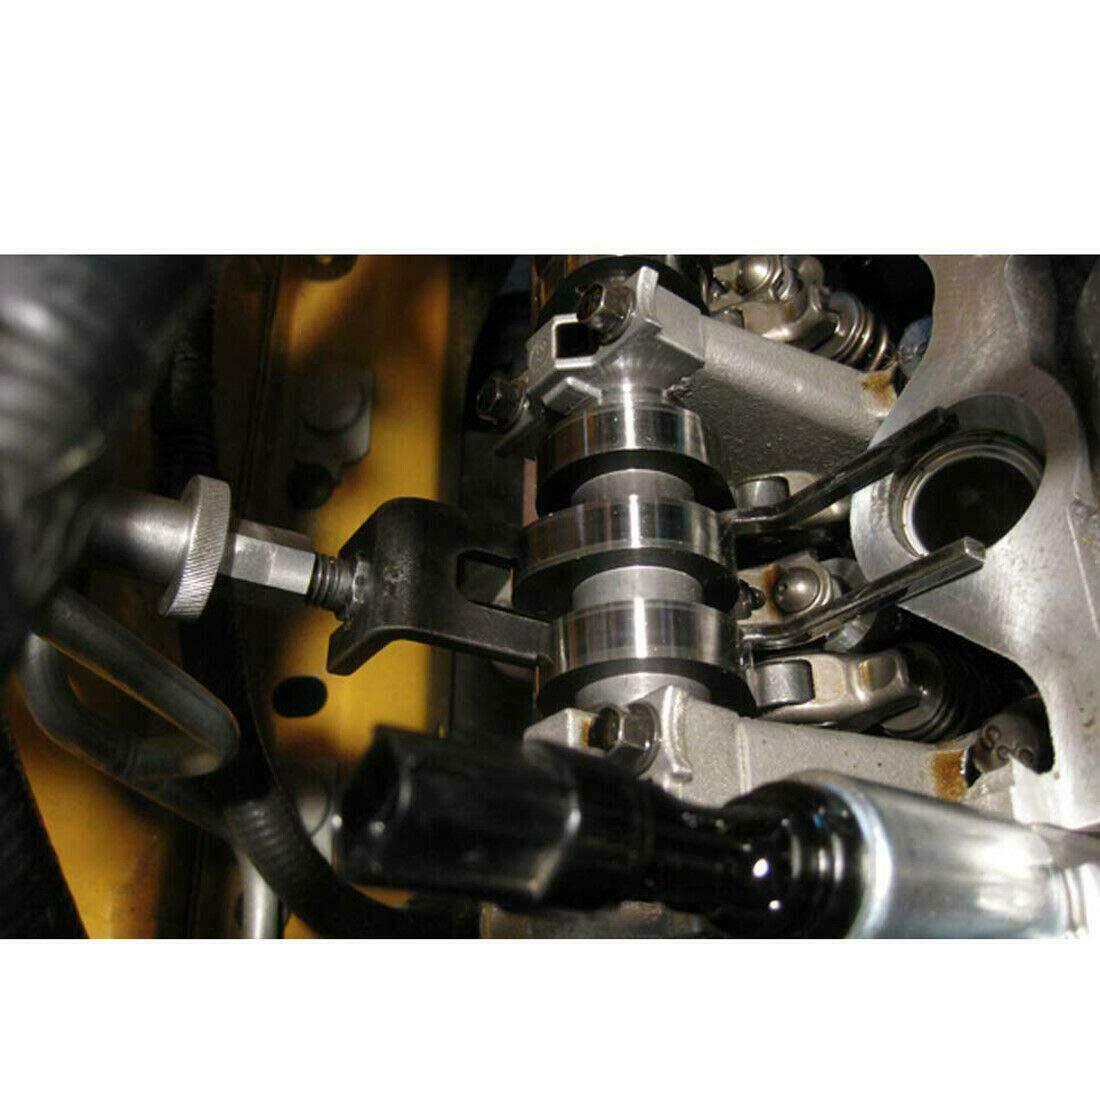 Rotunda 303-1039 Similar to OTC 6684 Vincool Valve Spring Compressor Tool for Ford 4.6L 6.8L 3V